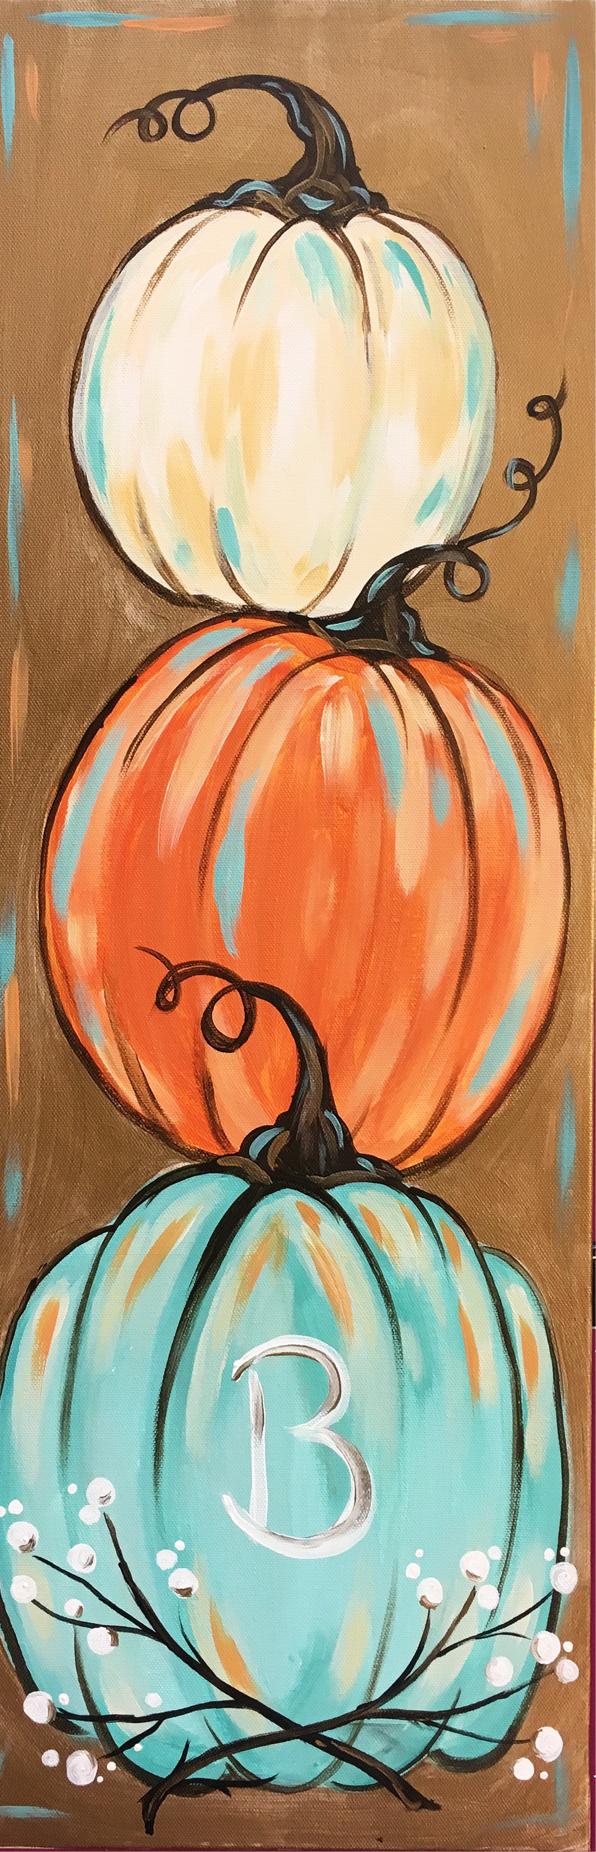 pleasantly-pumpkin